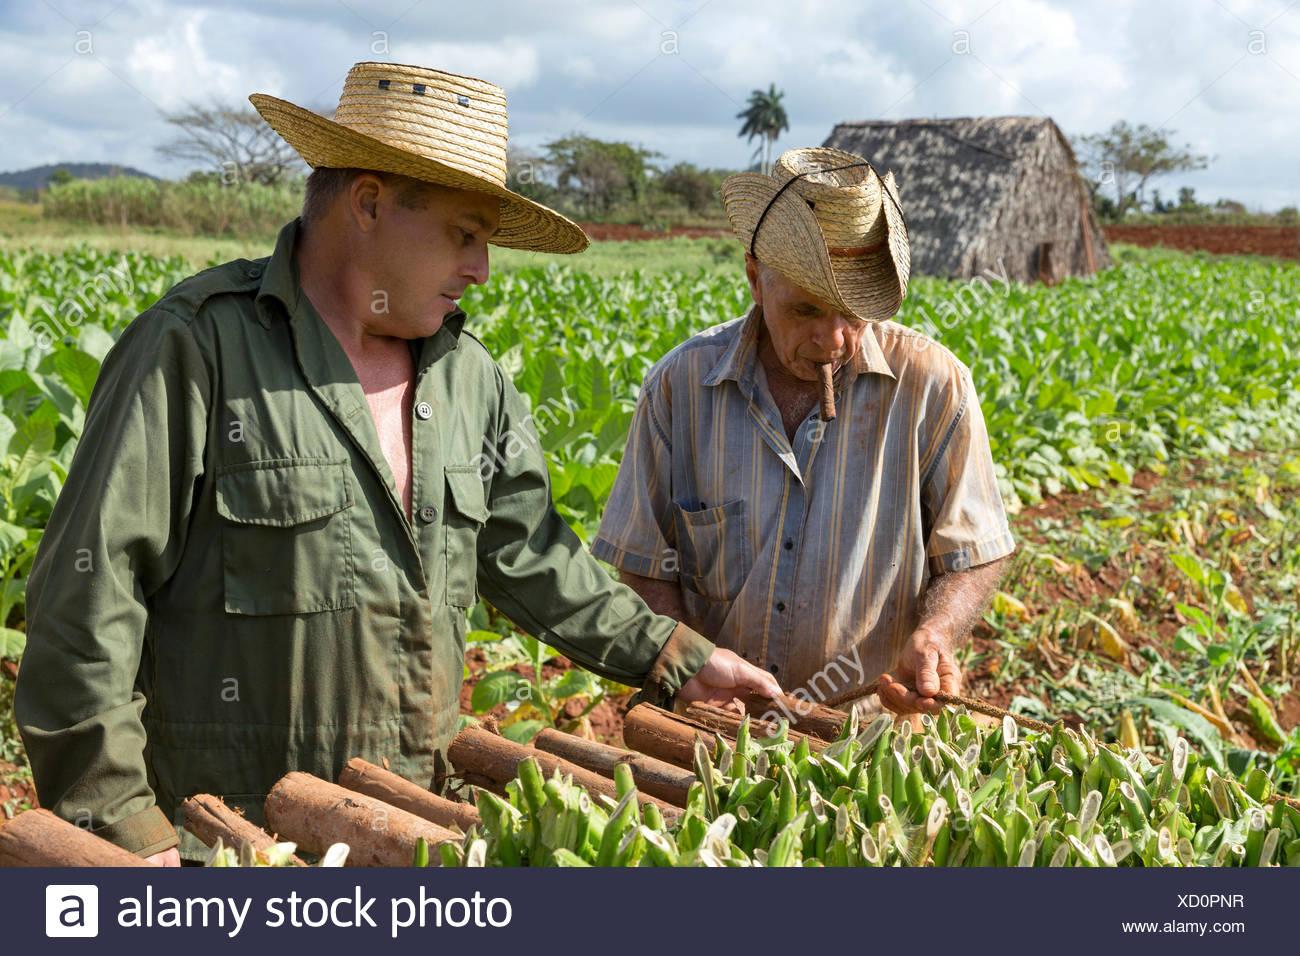 tabakpflanzen stock photos tabakpflanzen stock images alamy. Black Bedroom Furniture Sets. Home Design Ideas